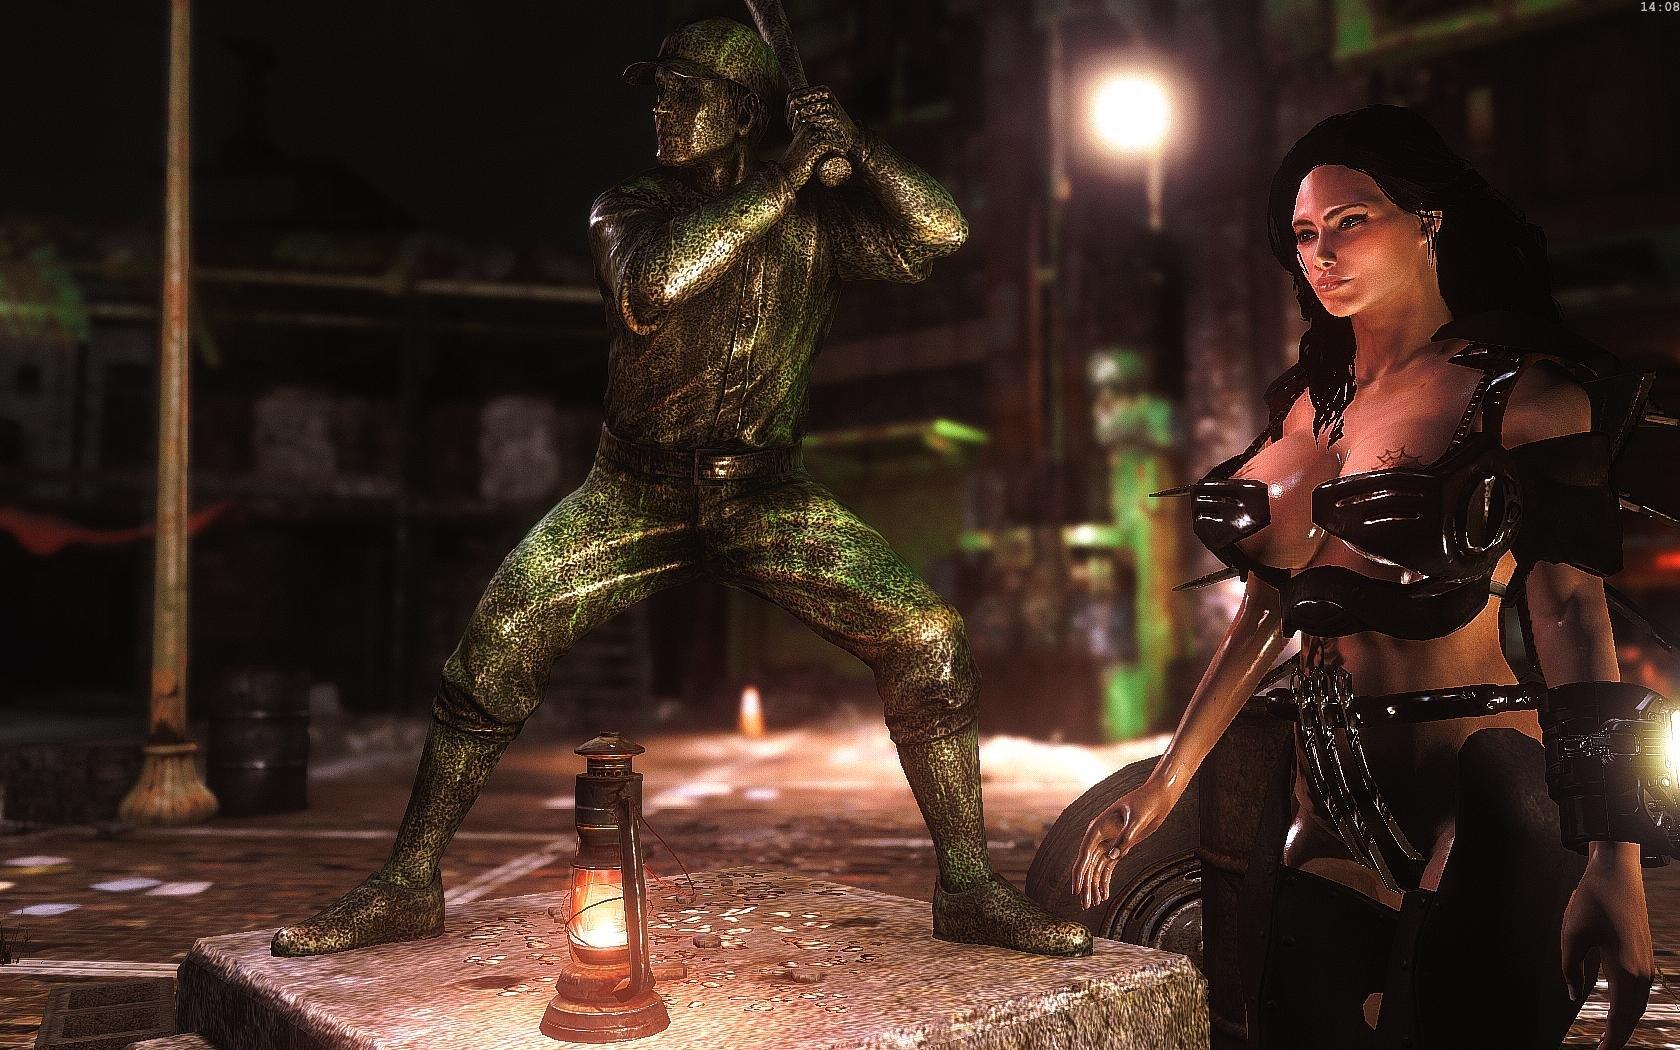 Fallout4 2019-02-08 14-08-59-44